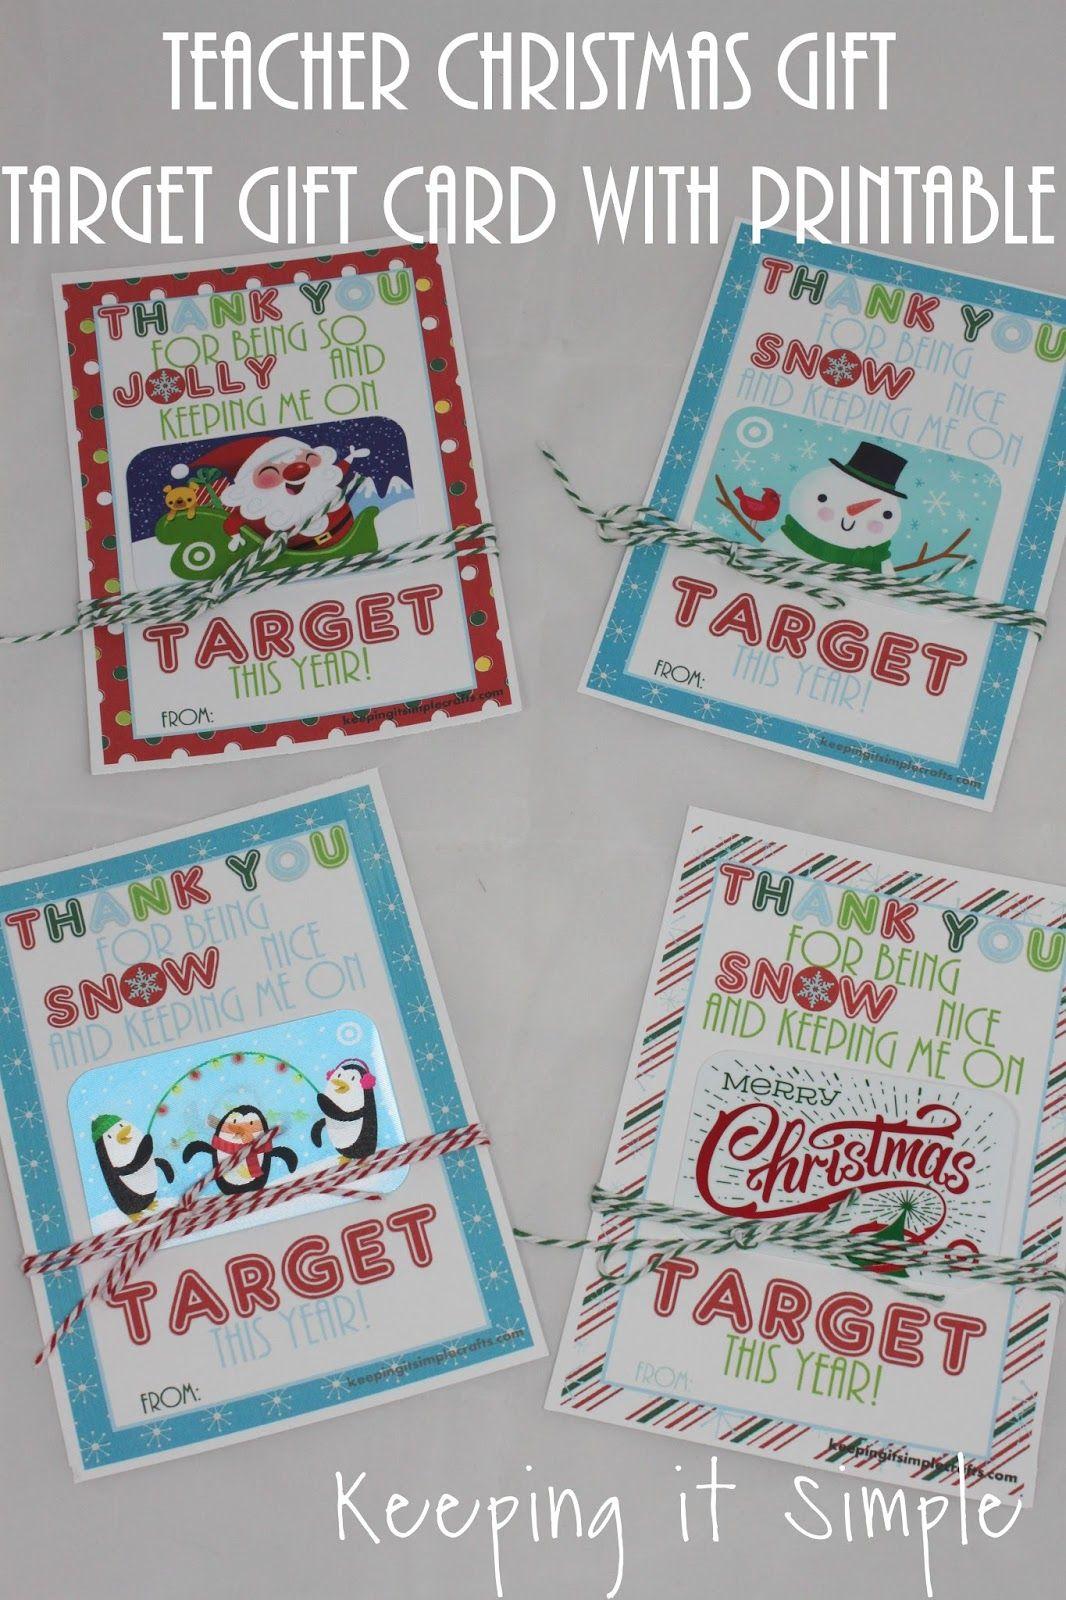 Teacher Christmas Gift idea Target gift card with